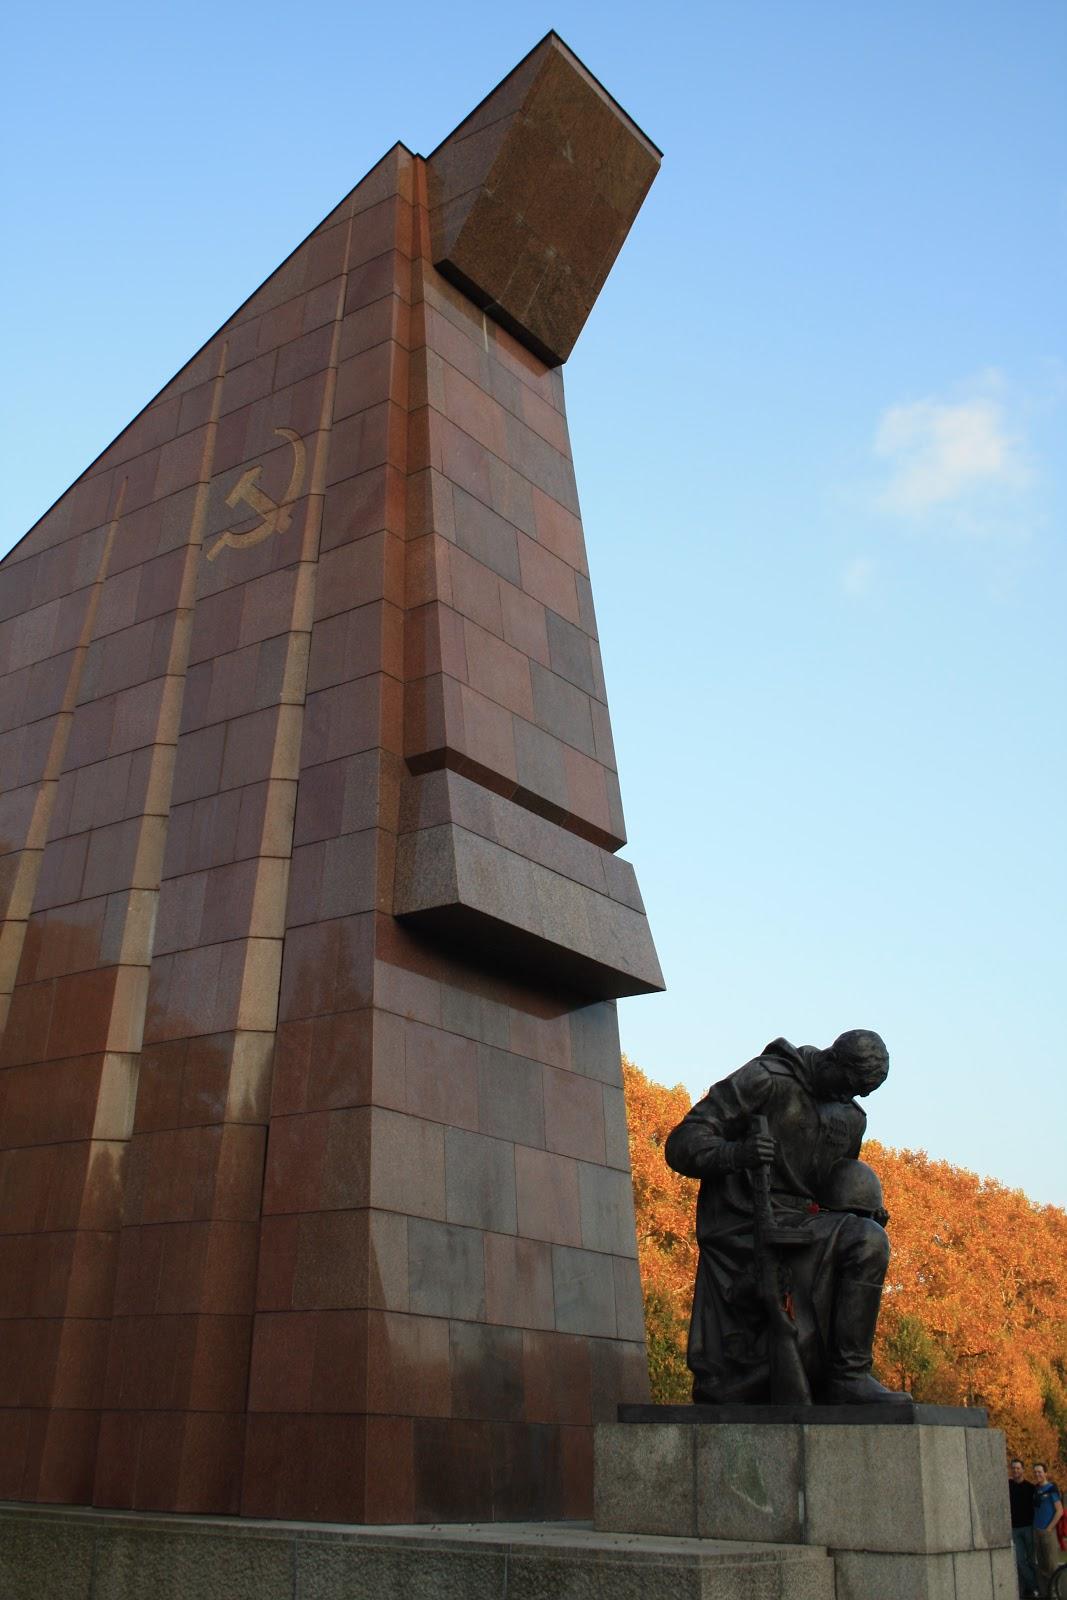 Soldat gardant les tombes des Russes - Treptower Park Berlin